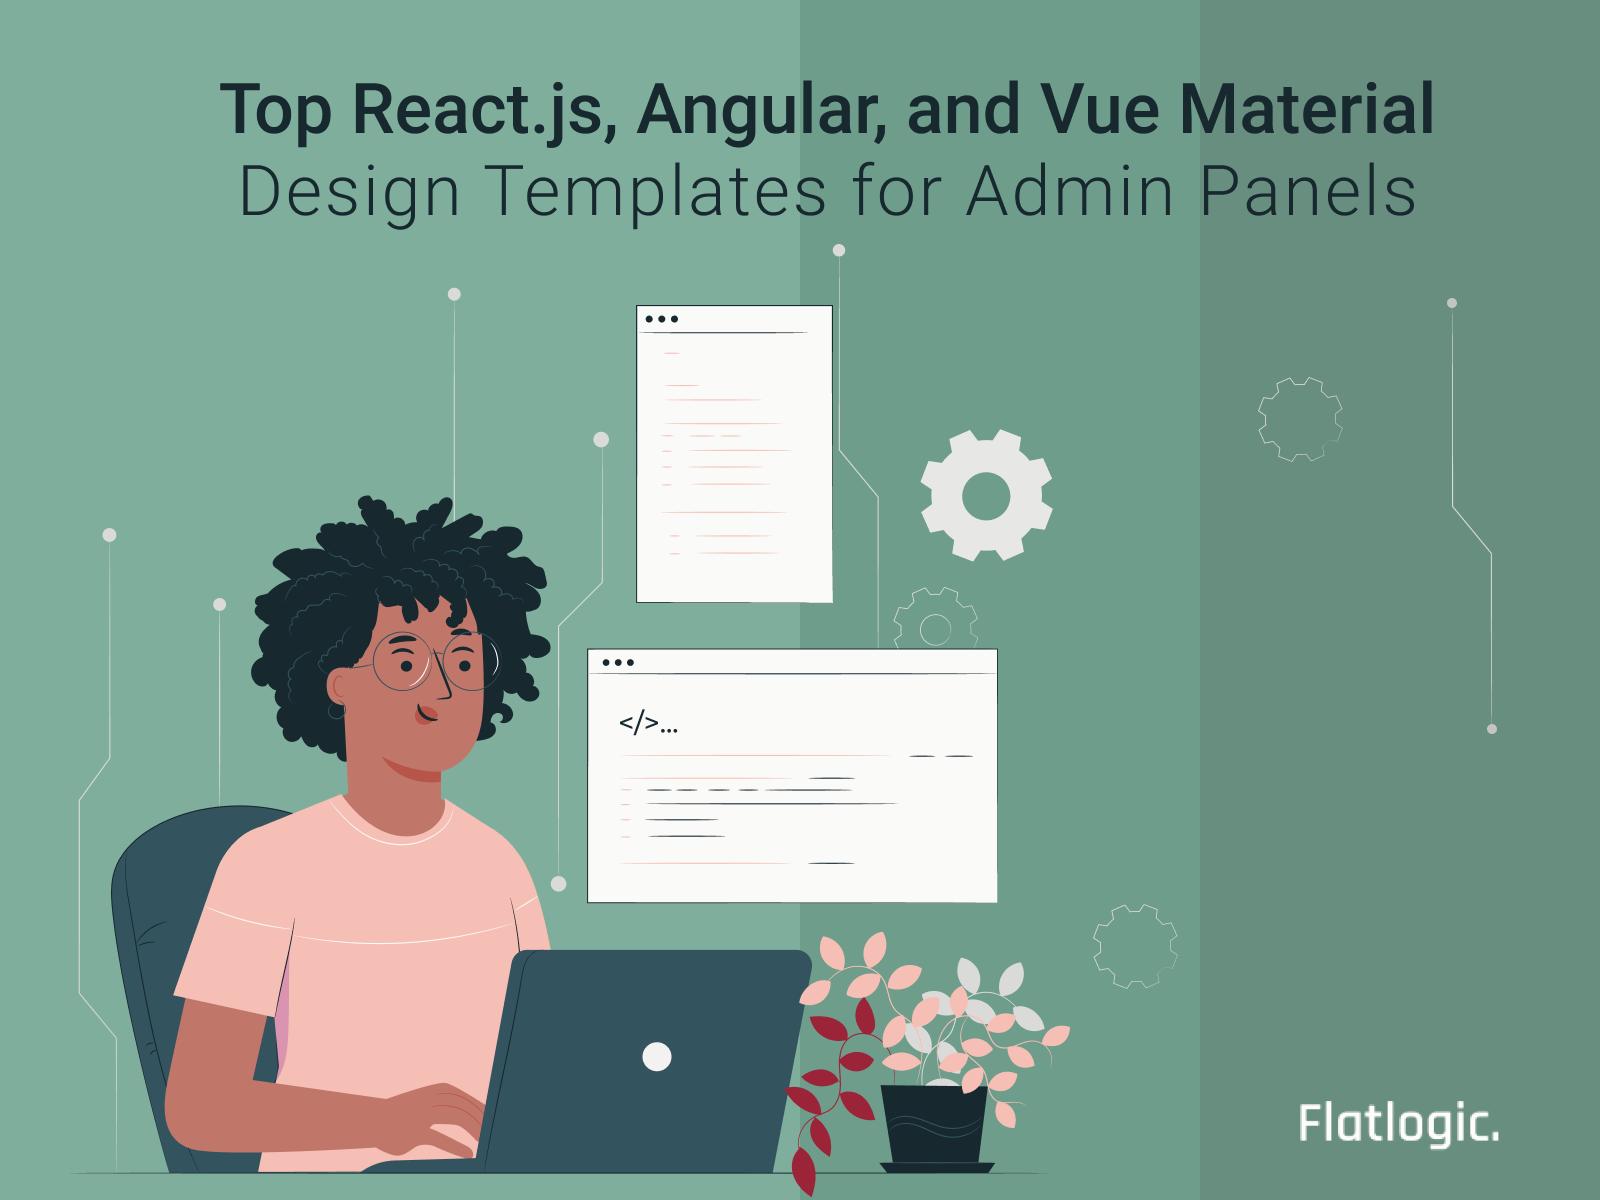 Top 7 React.js, Angular, and Vue Material Design Templates for Admin Panels